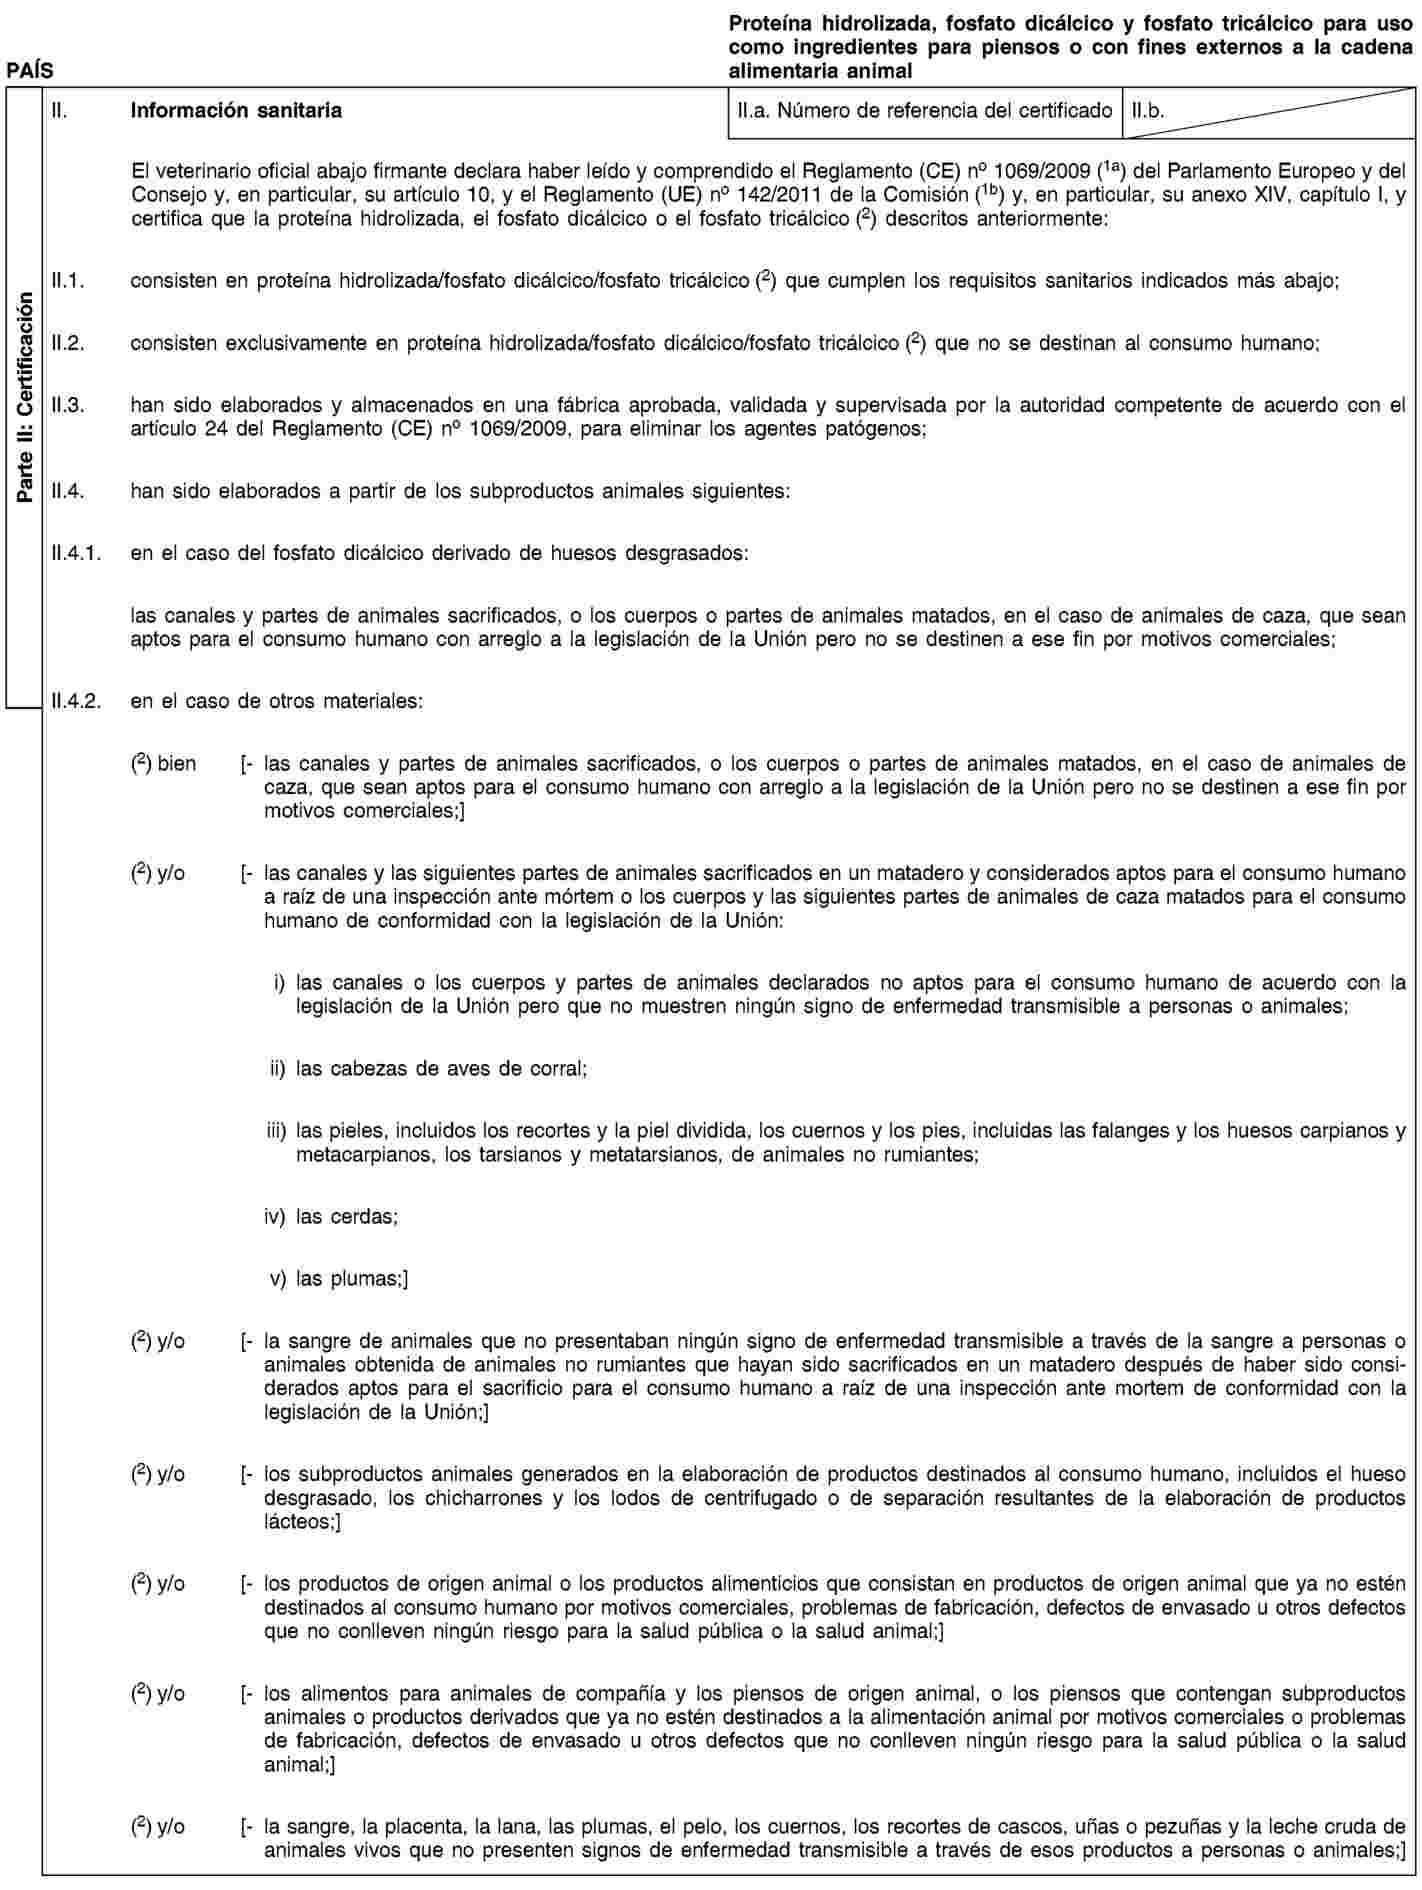 Imagen: https://eur-lex.europa.eu/resource.html?uri=uriserv:OJ.L_.2011.054.01.0001.01.SPA.xhtml.L_2011054ES.01021901.tif.jpg